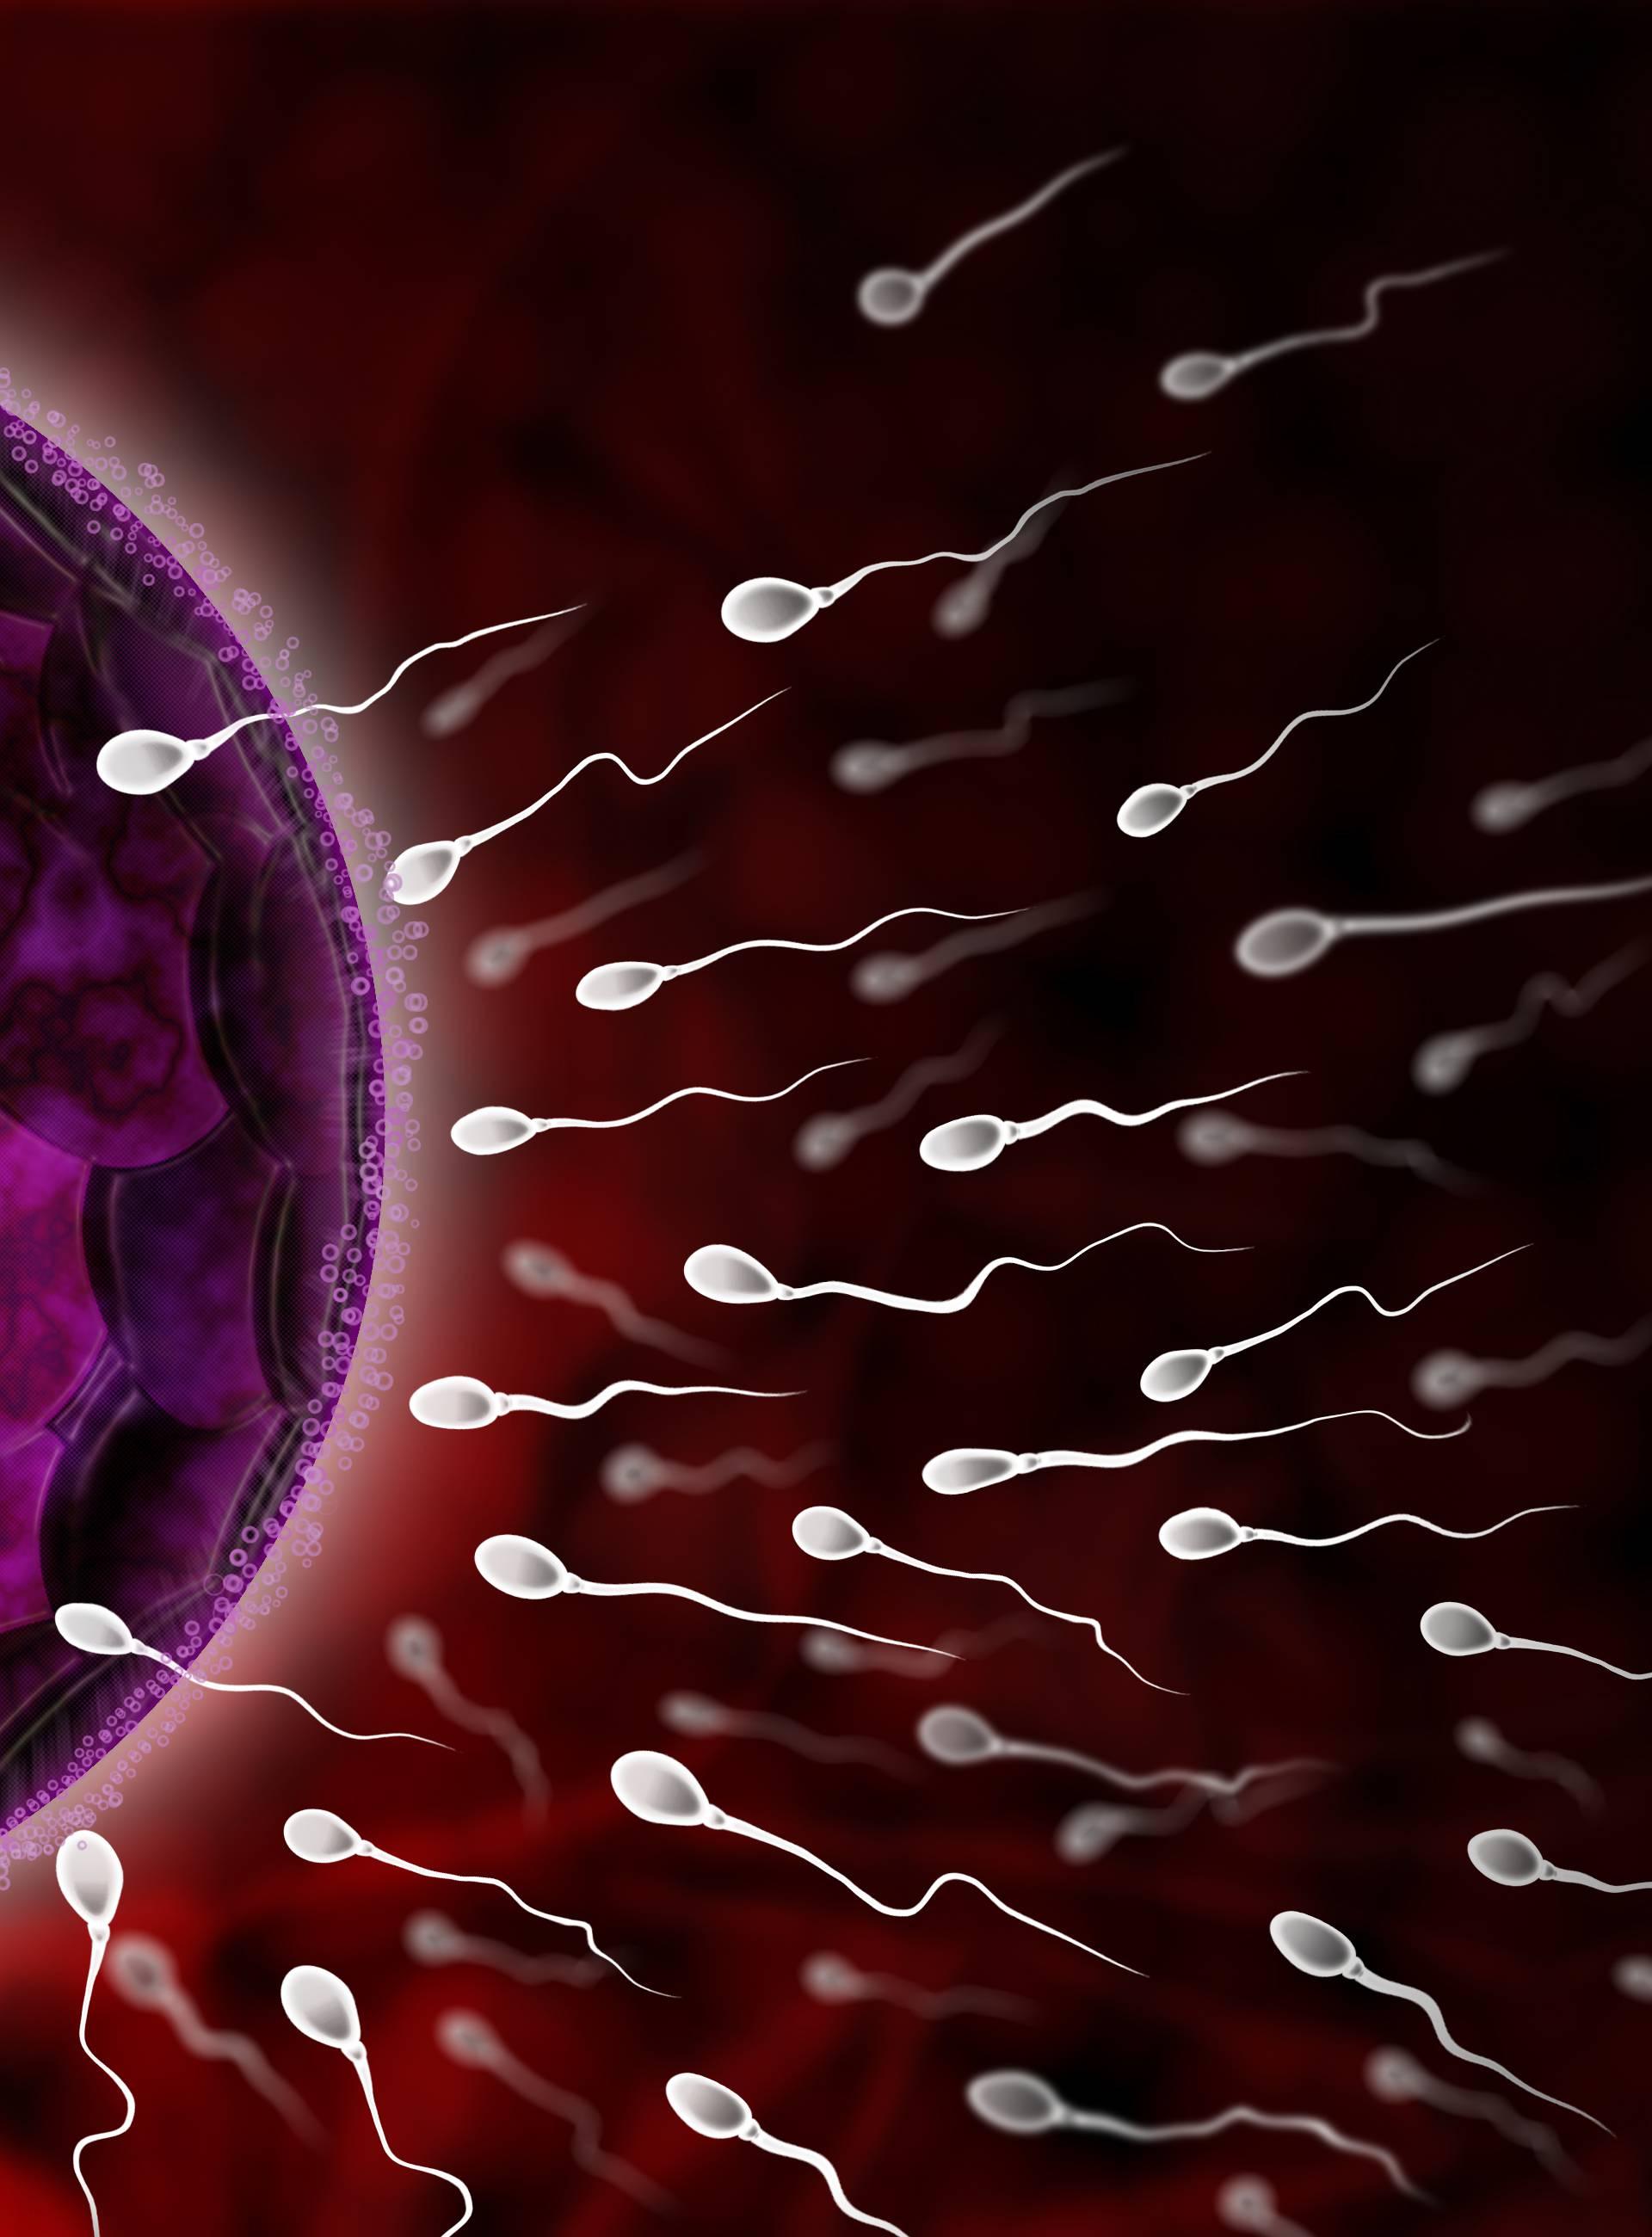 Presadili mu koštanu srž pa u spermi sad ima donorovu DNK